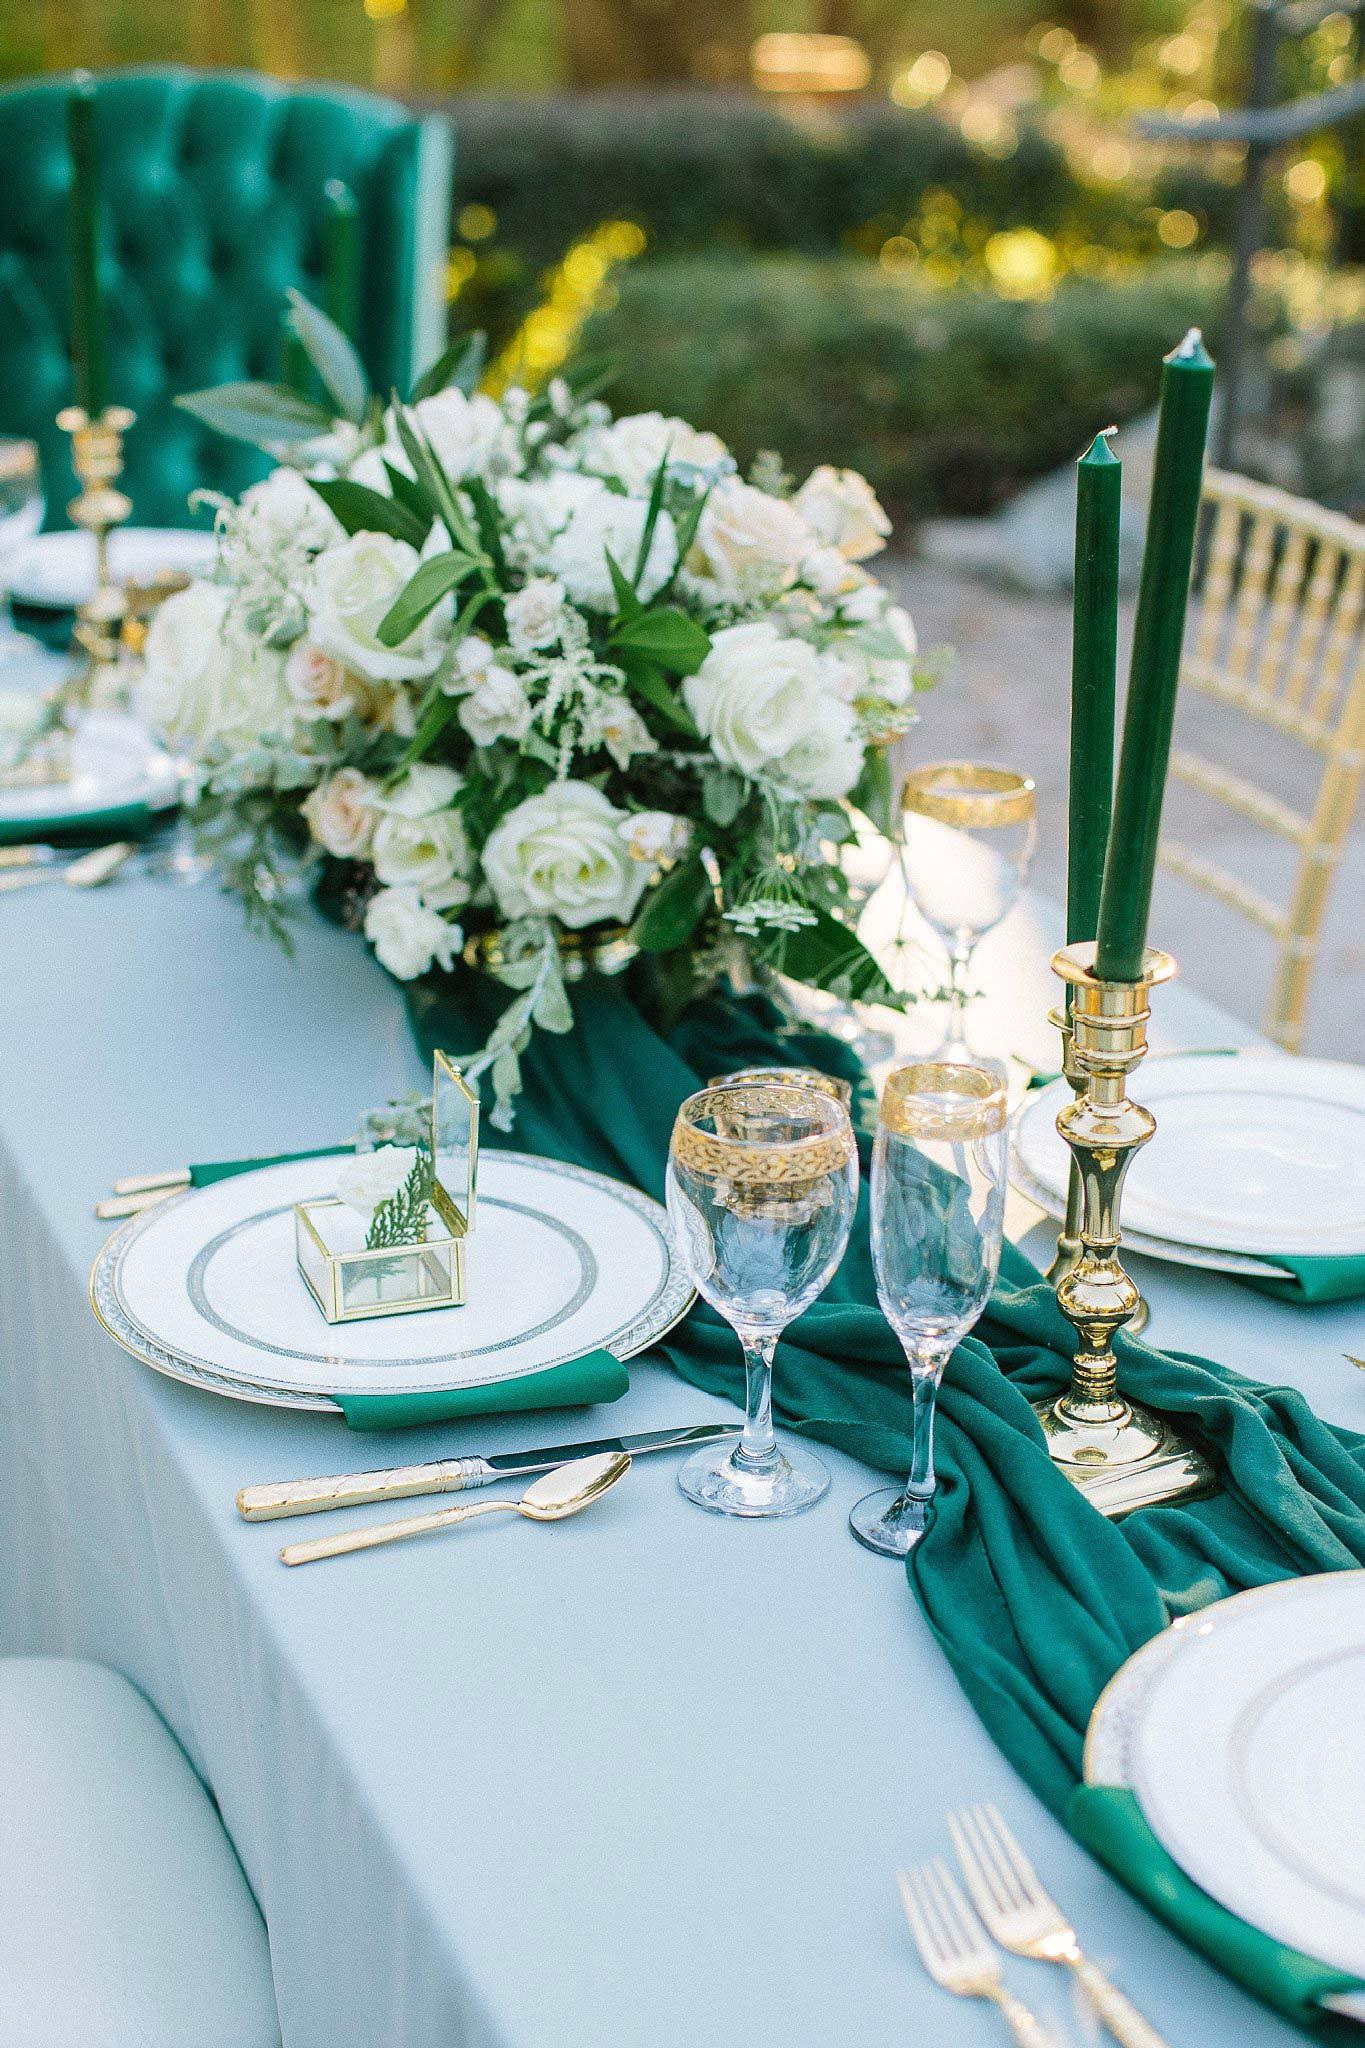 aristide mansfield wedding grey reception table with green runner